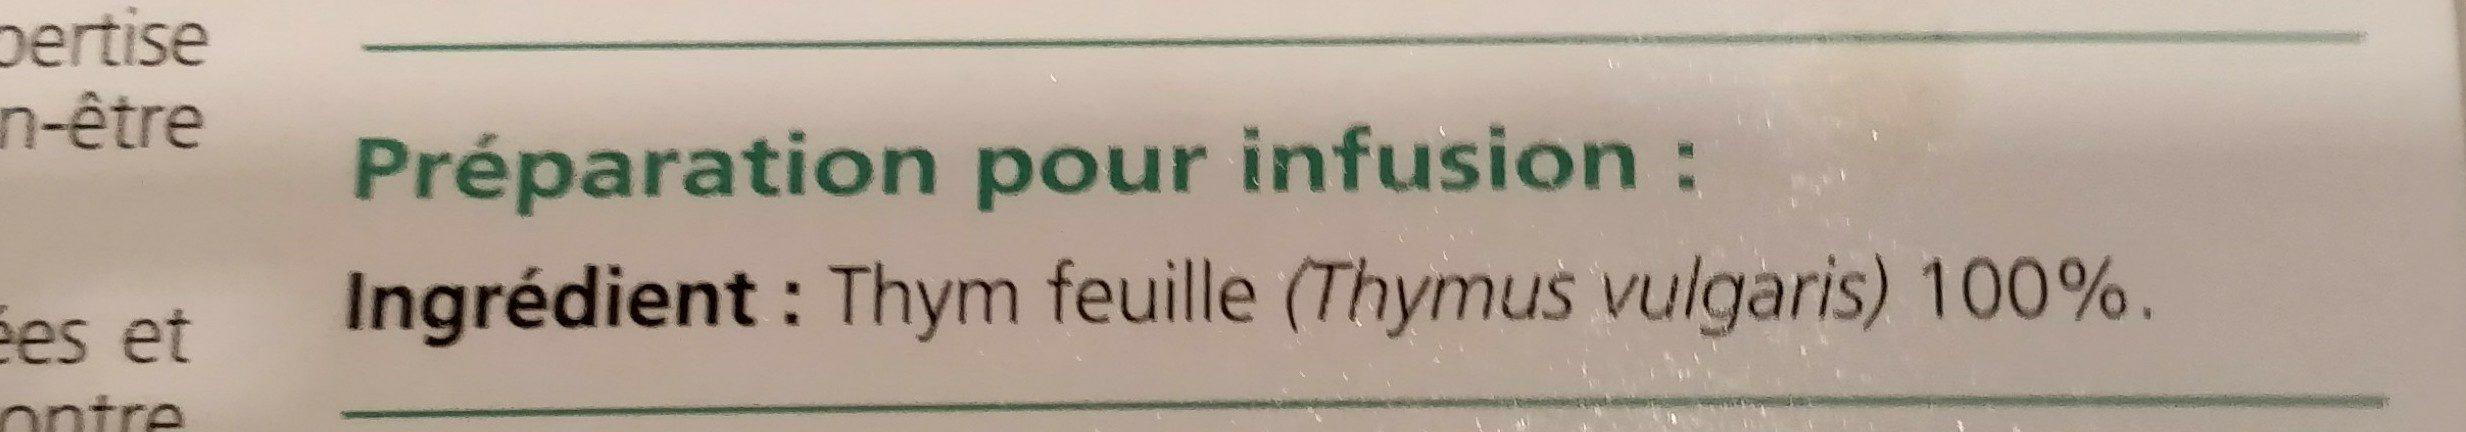 Médiflor Infusions Thym 24 Sachets - Ingrédients - fr